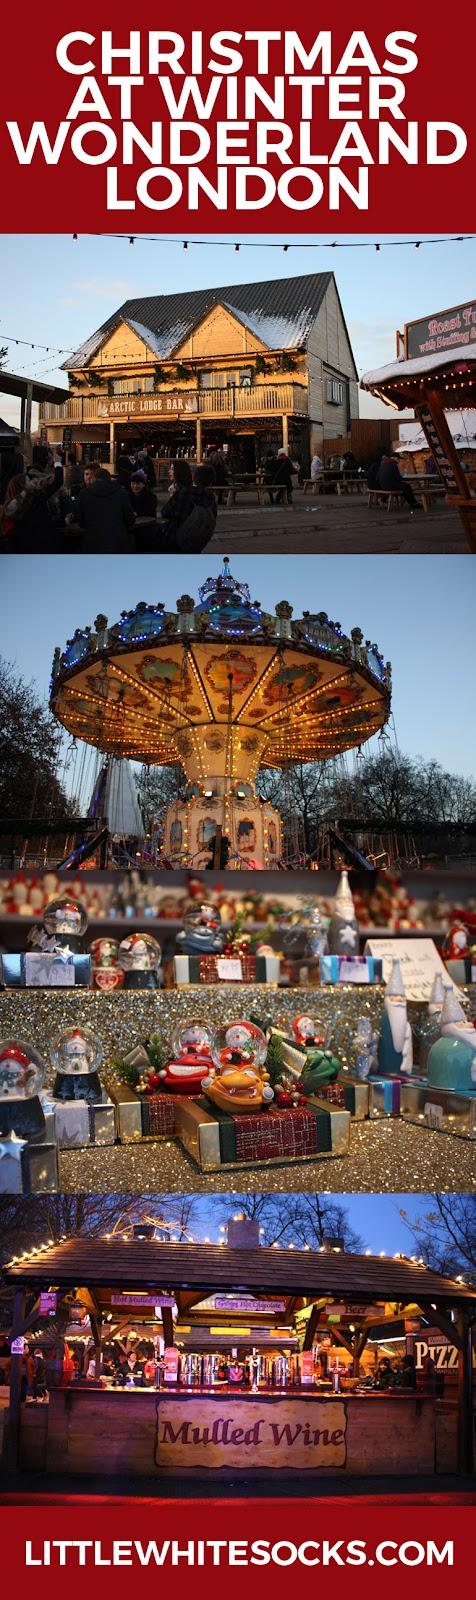 christmas at winter wonderland london